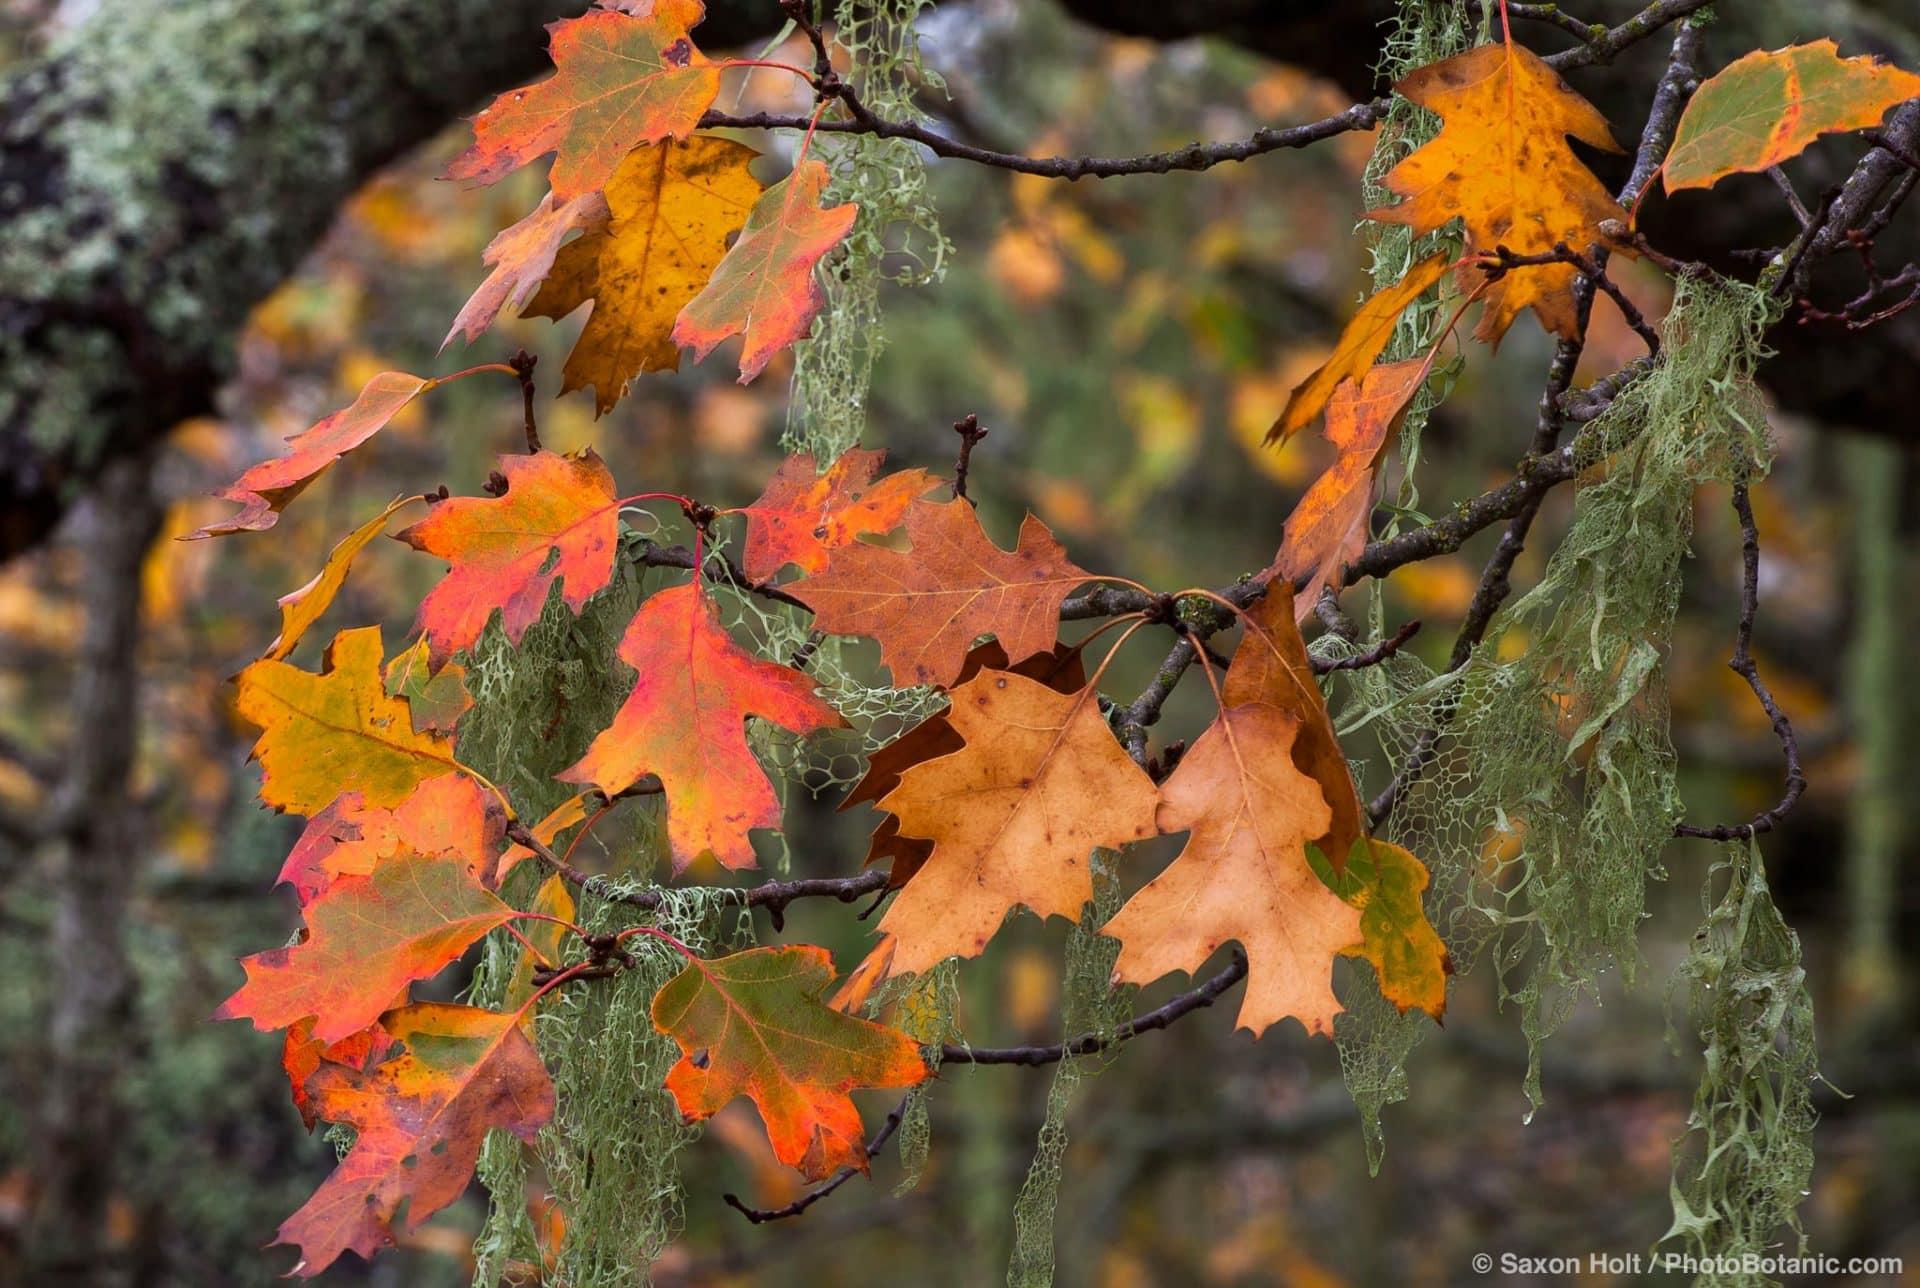 Oak trees in autumn on Pinheiro Fire Road, Rush Creek Open Space, Marin County